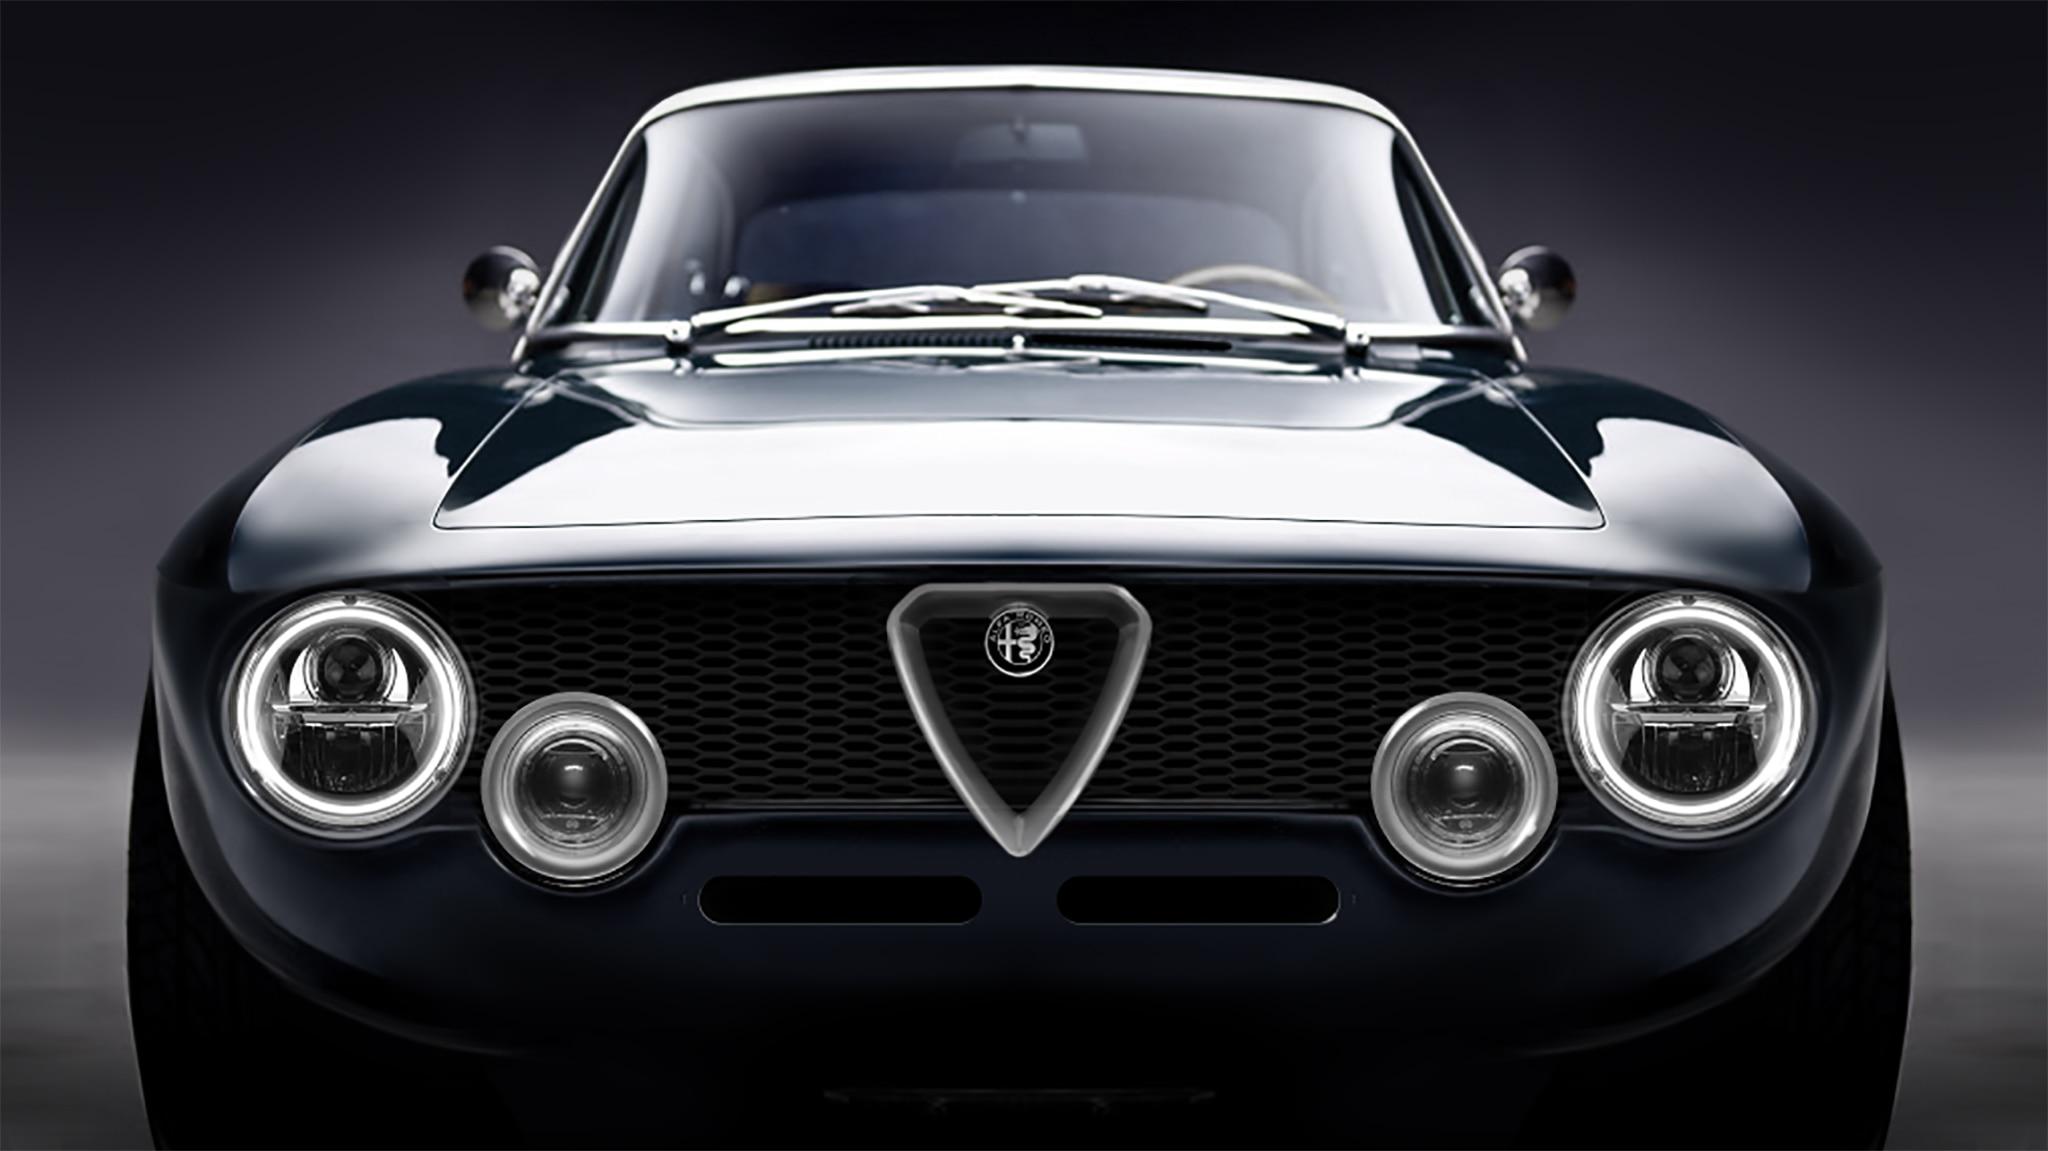 Alfa Romeo Giulia >> Stunning Alfa Romeo Giulia GT Restomod Is Electric, Has 518 HP